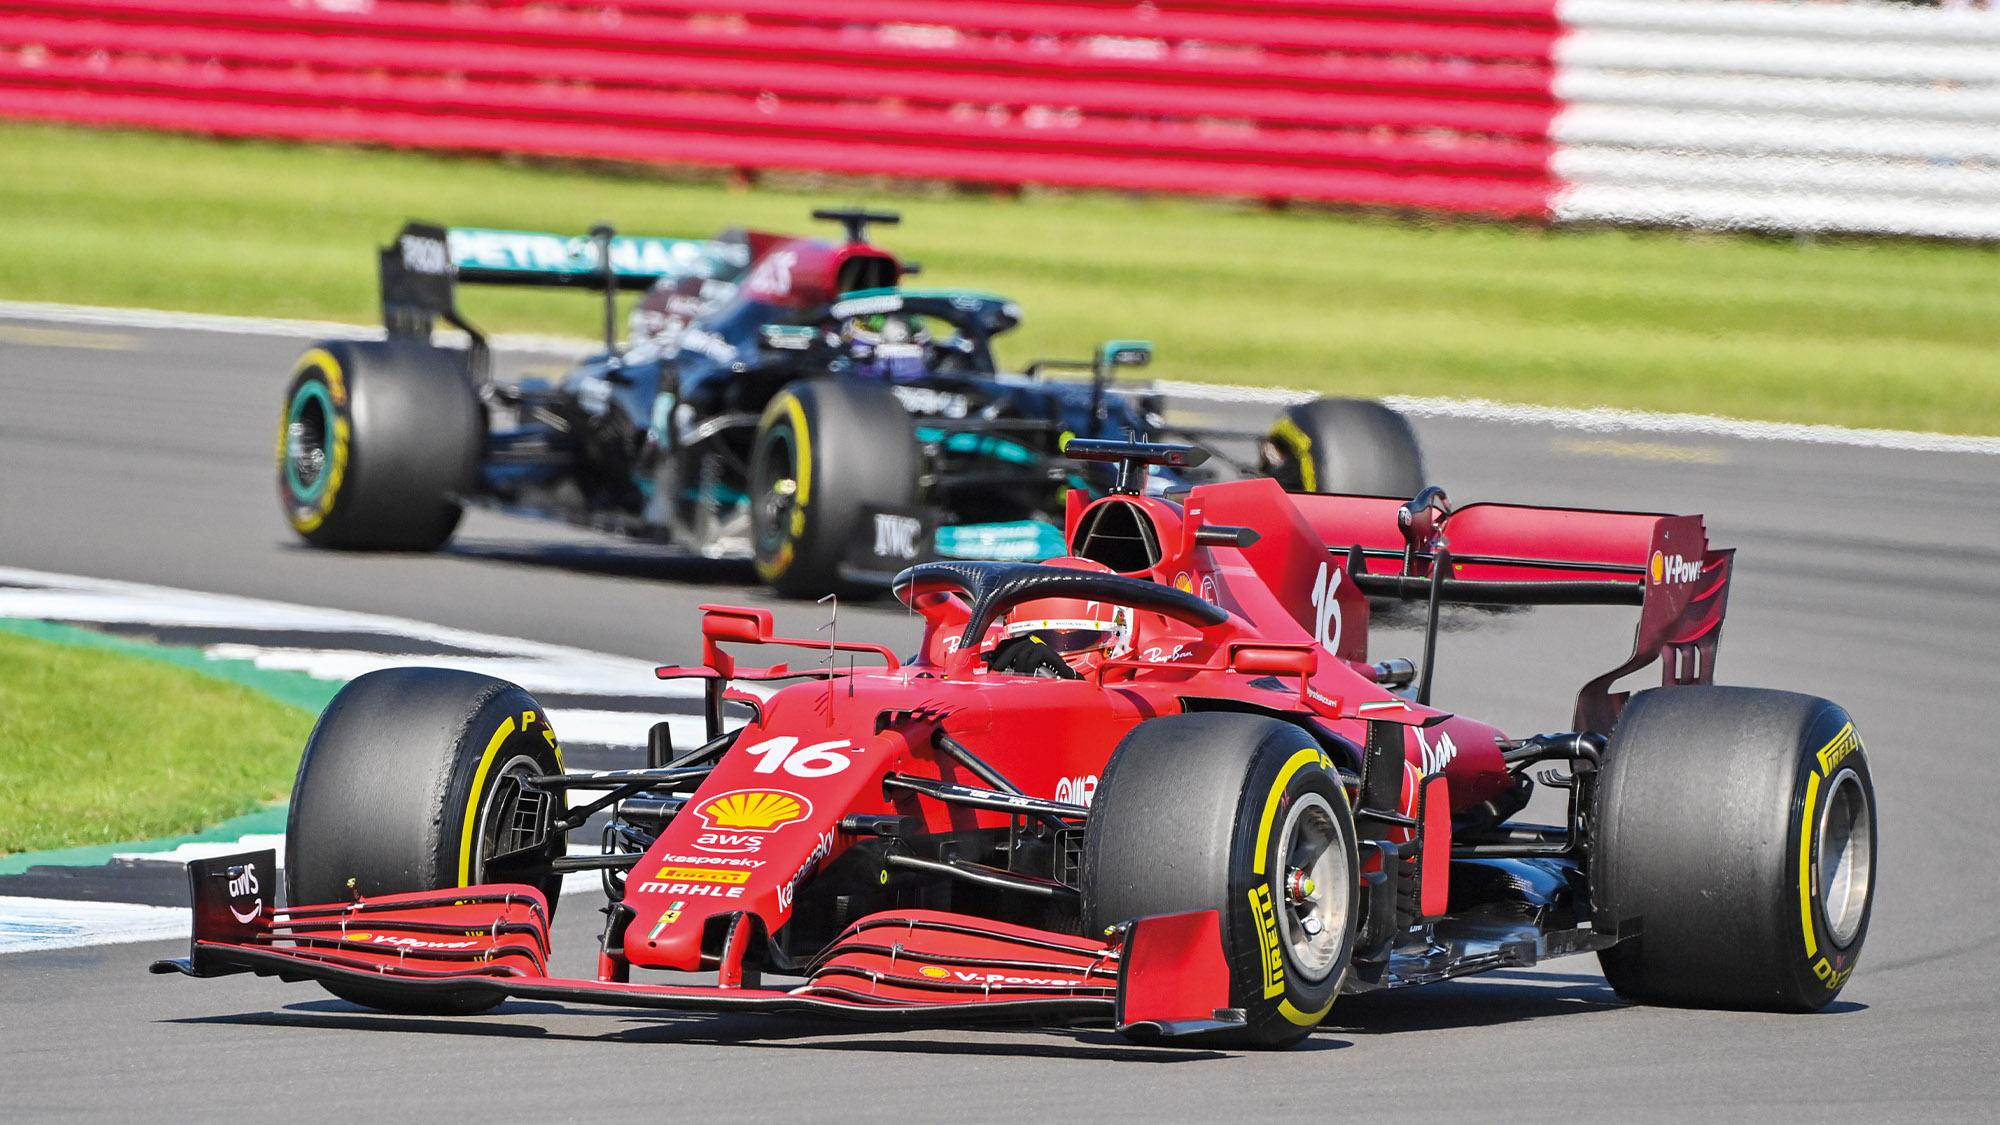 Charles Leclerc ahead of Lewis Hamilton at the 2021 British Grand Prix